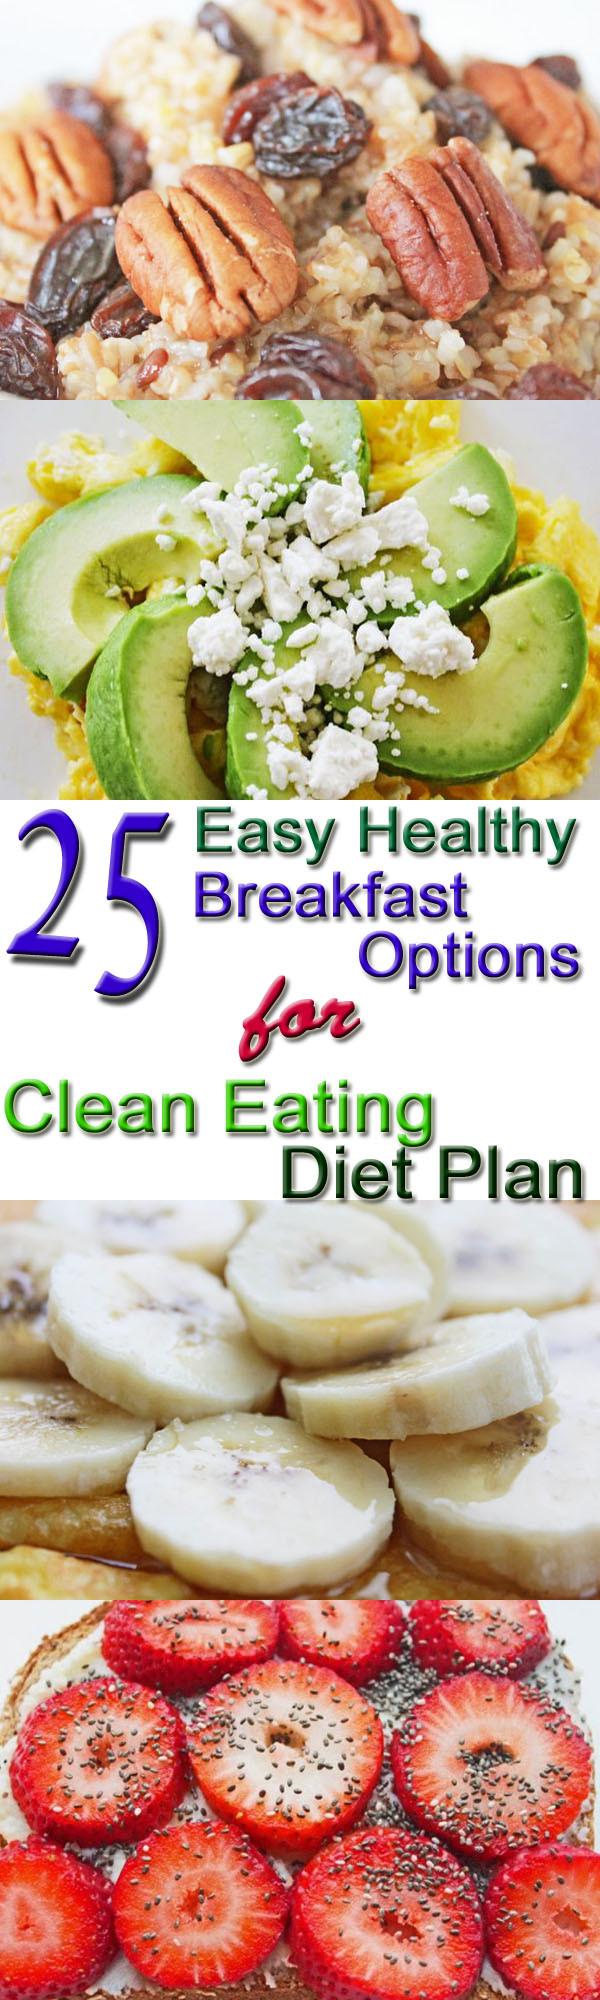 Simple Healthy Breakfast Recipes  25 Healthy Breakfast Options